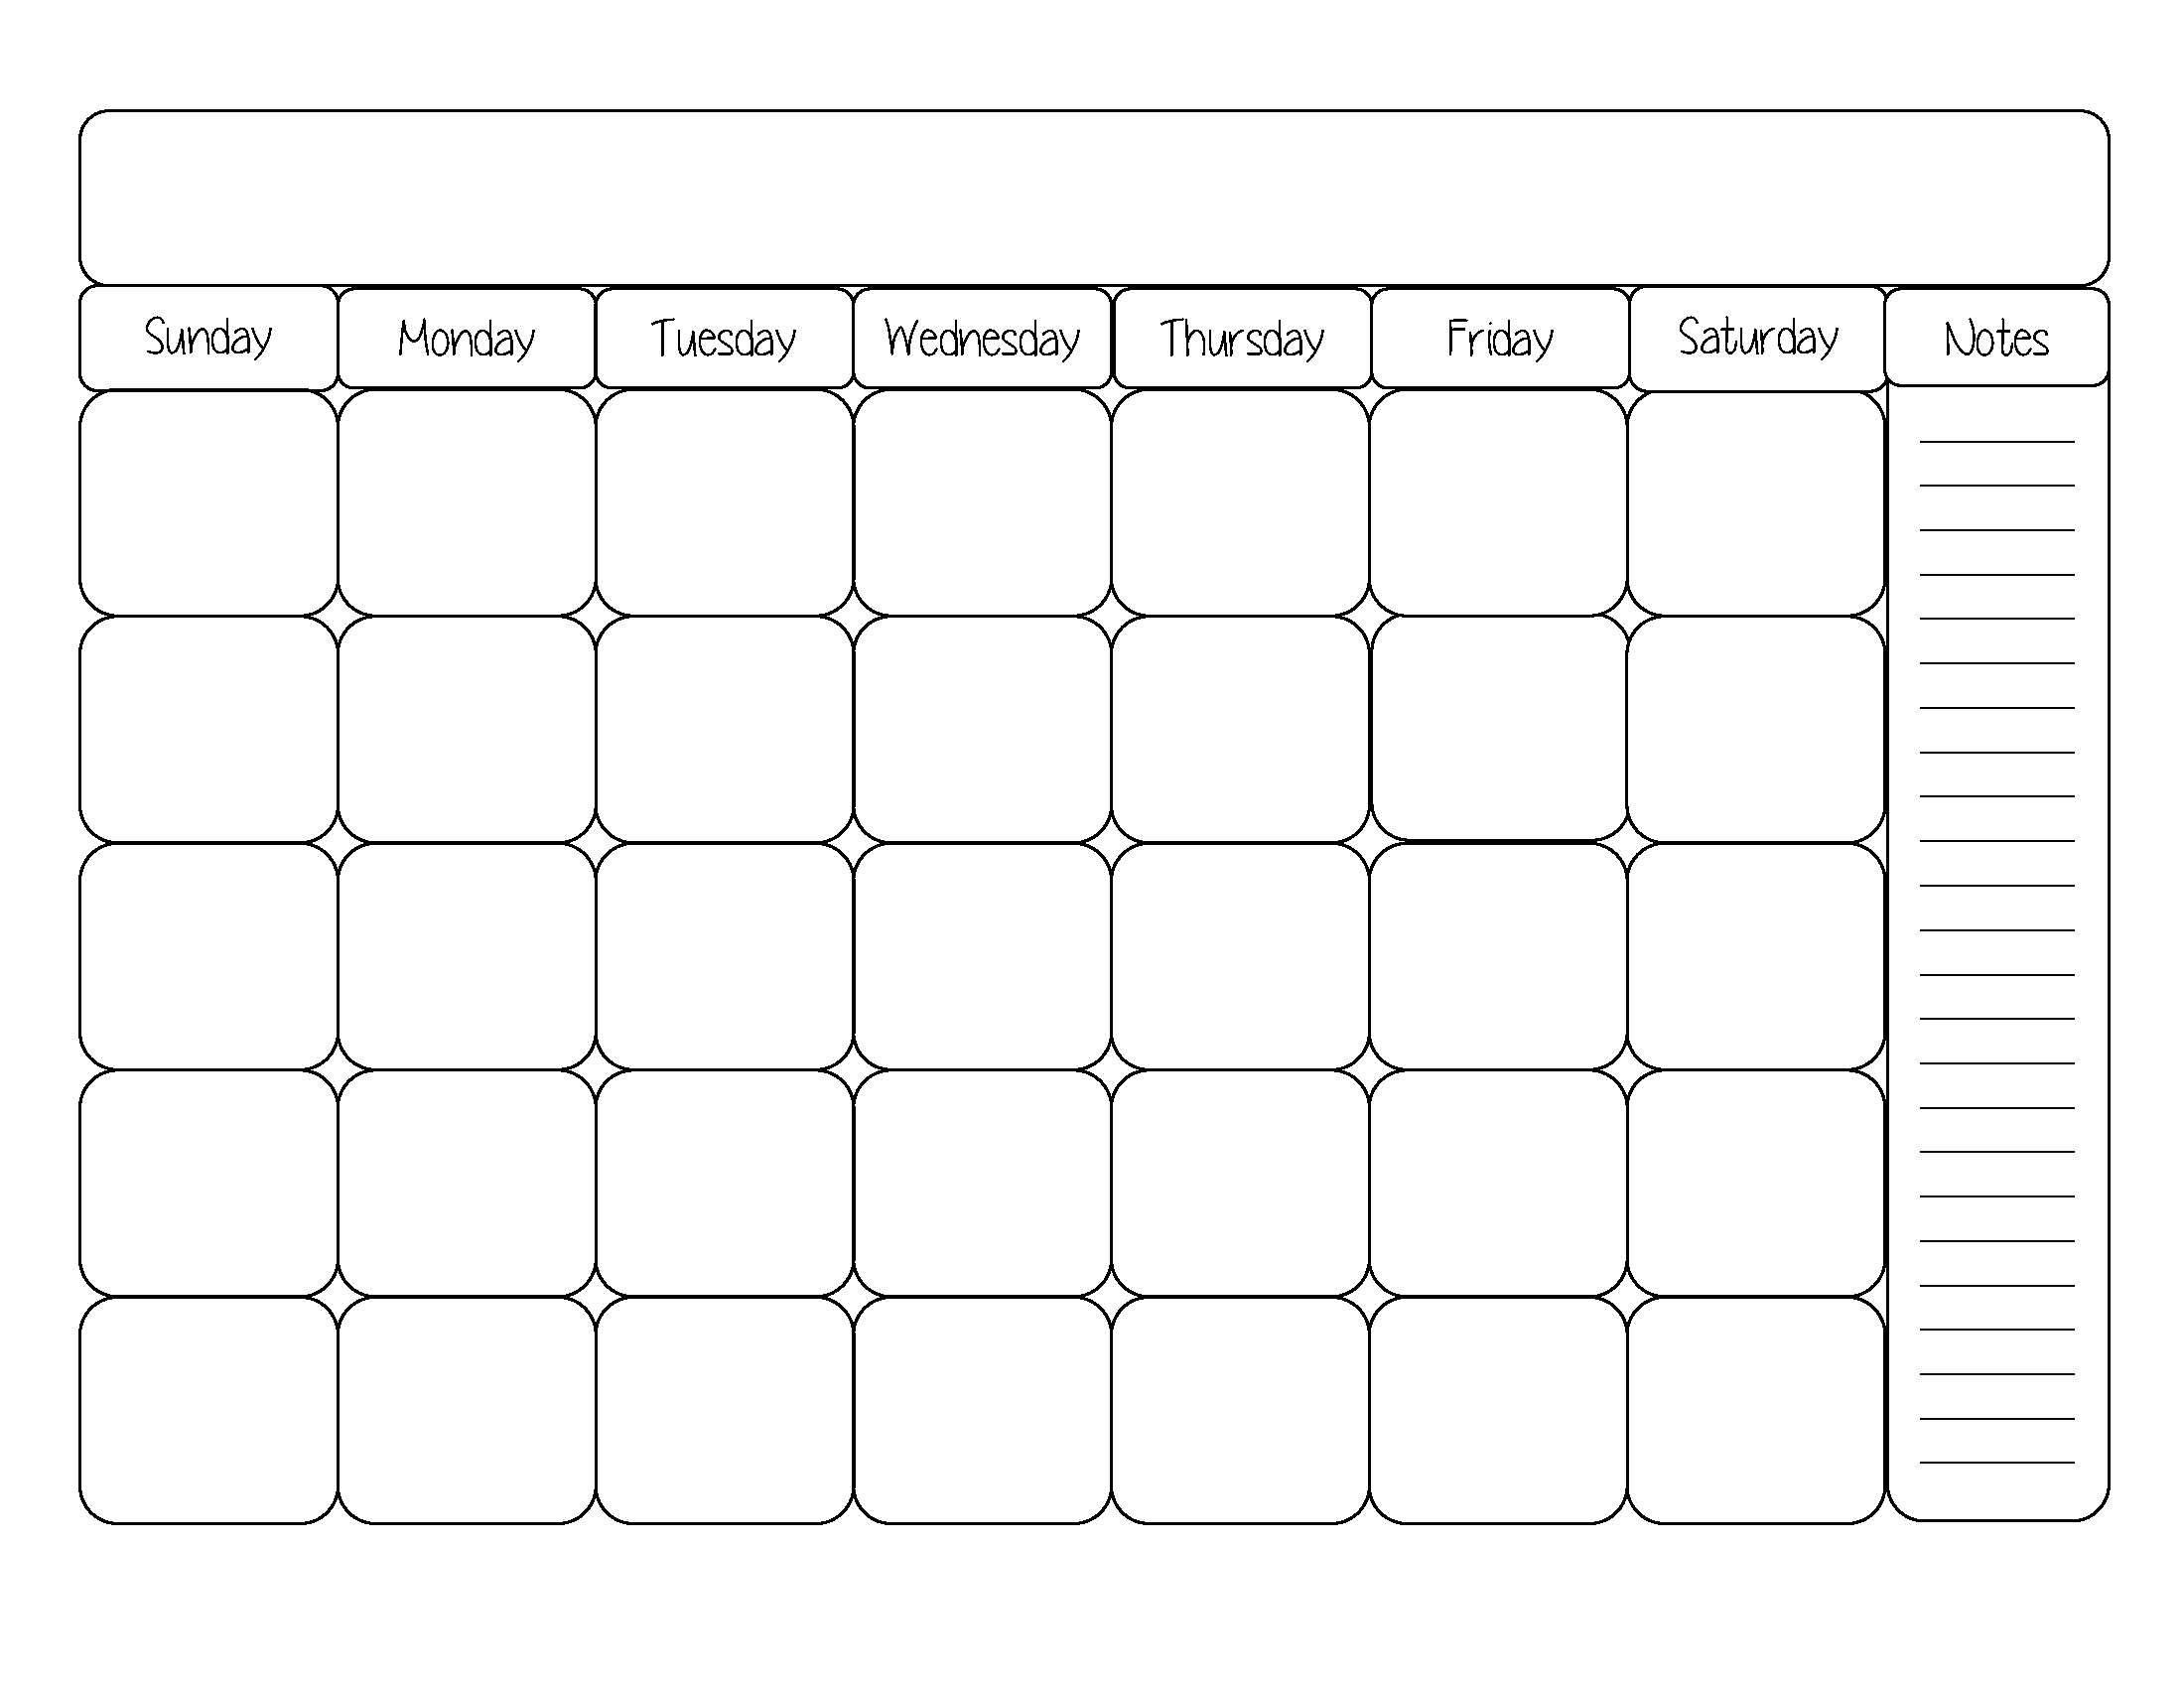 Printable Blank Calendar Template Word, Excel, Pdf